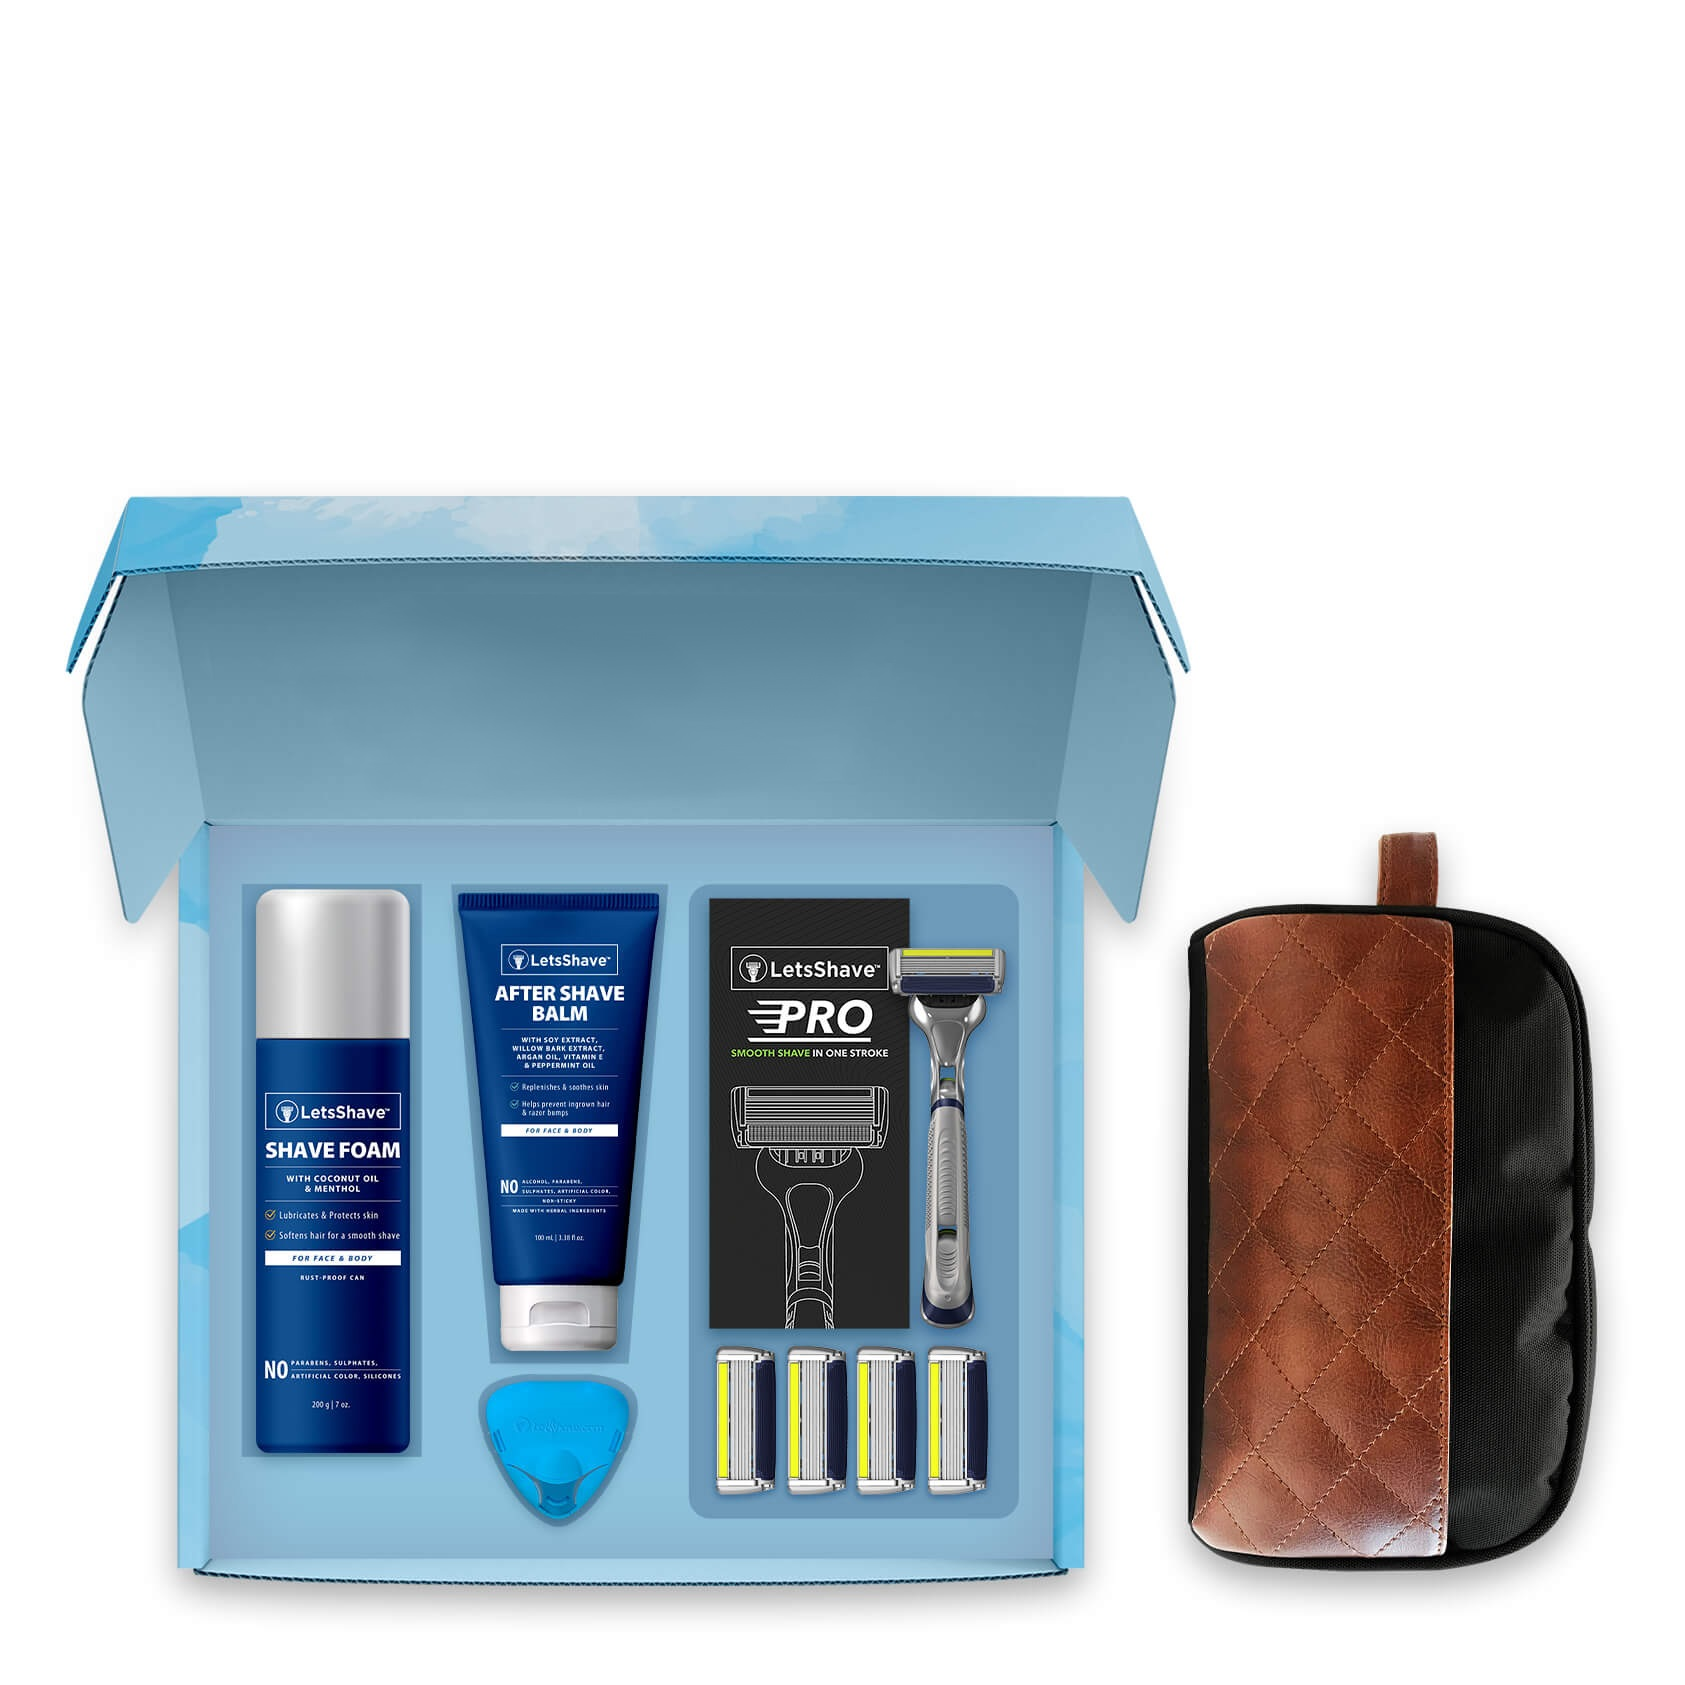 LetsShave | LetsShave Pro 6 Plus Premium Gift Set - Pack of 4 Pro 6 Plus Blades + Razor Handle + Shave Foam - 200g + After Shave Balm + Travel Bag + Travel Cap